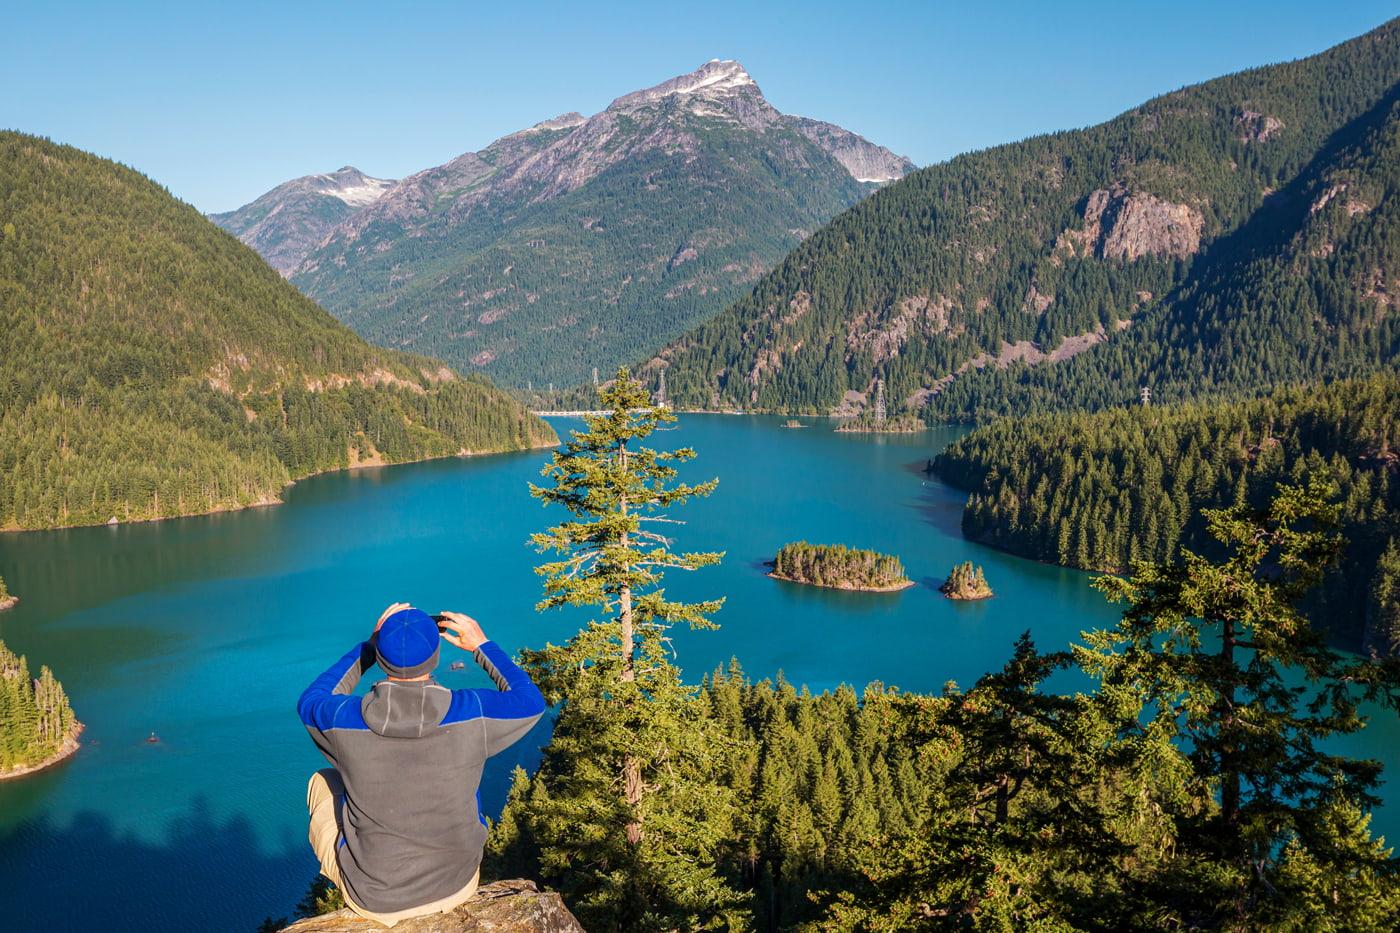 Washington for nature lovers